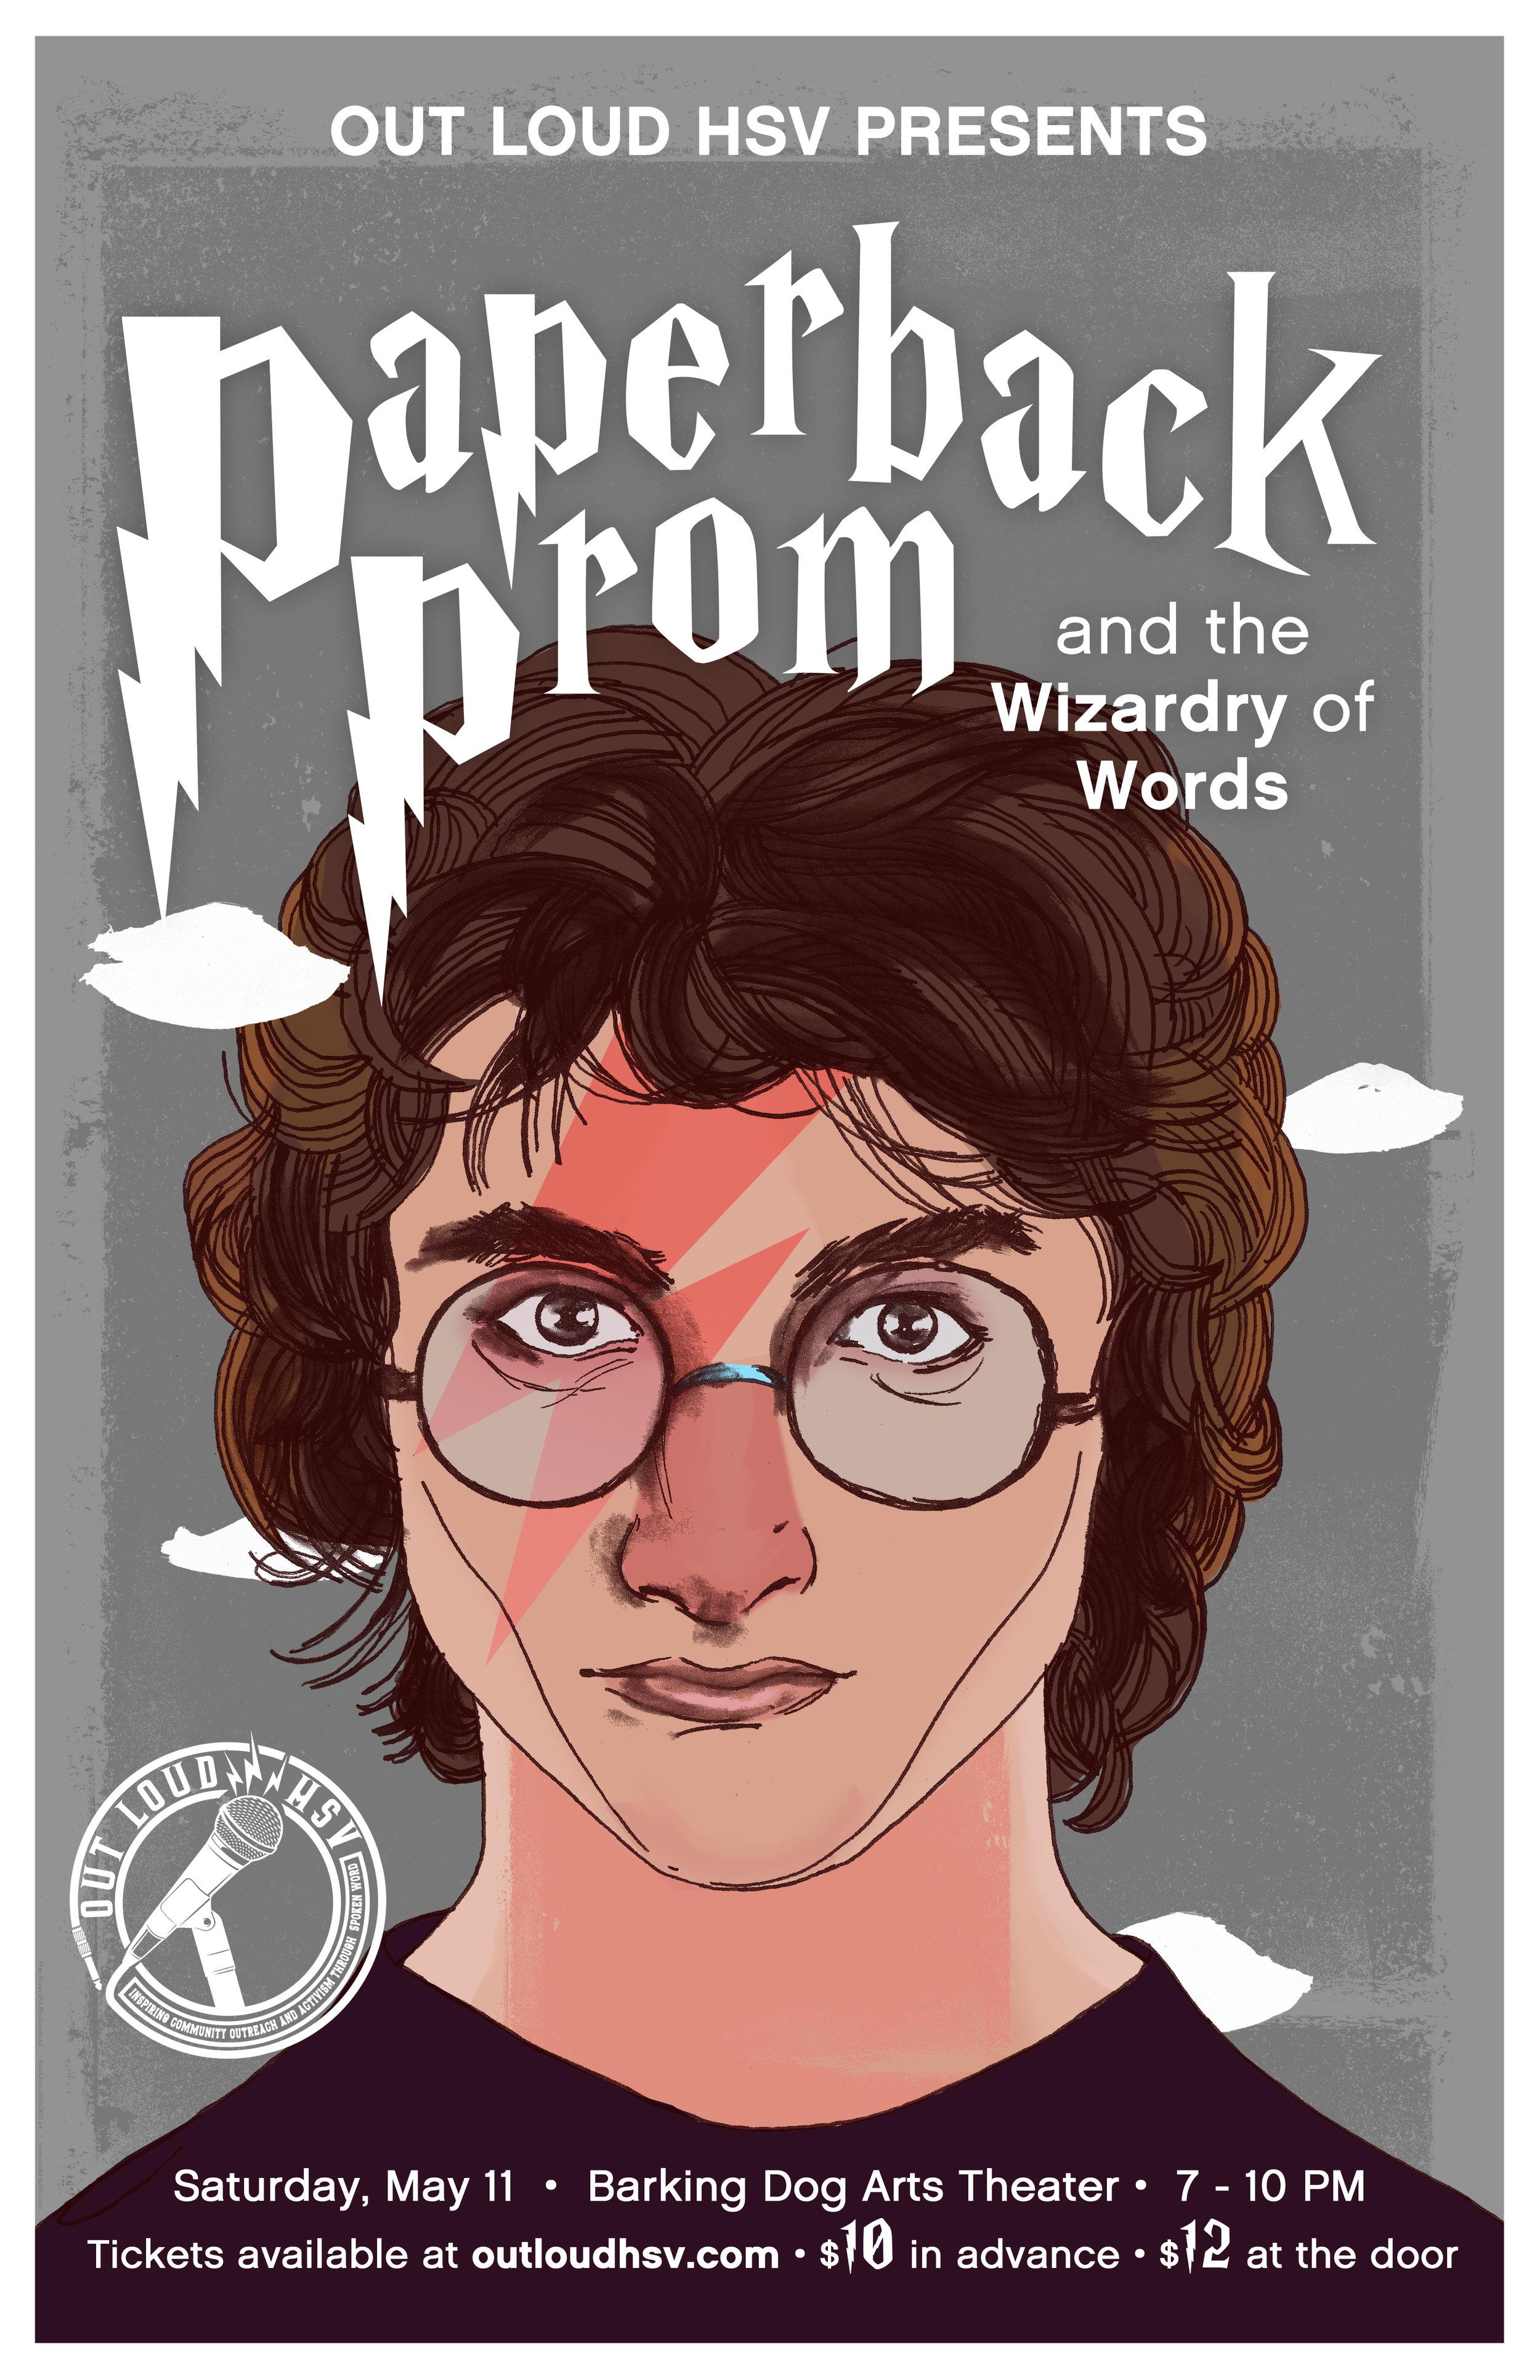 Paperback Prom 2019.jpg